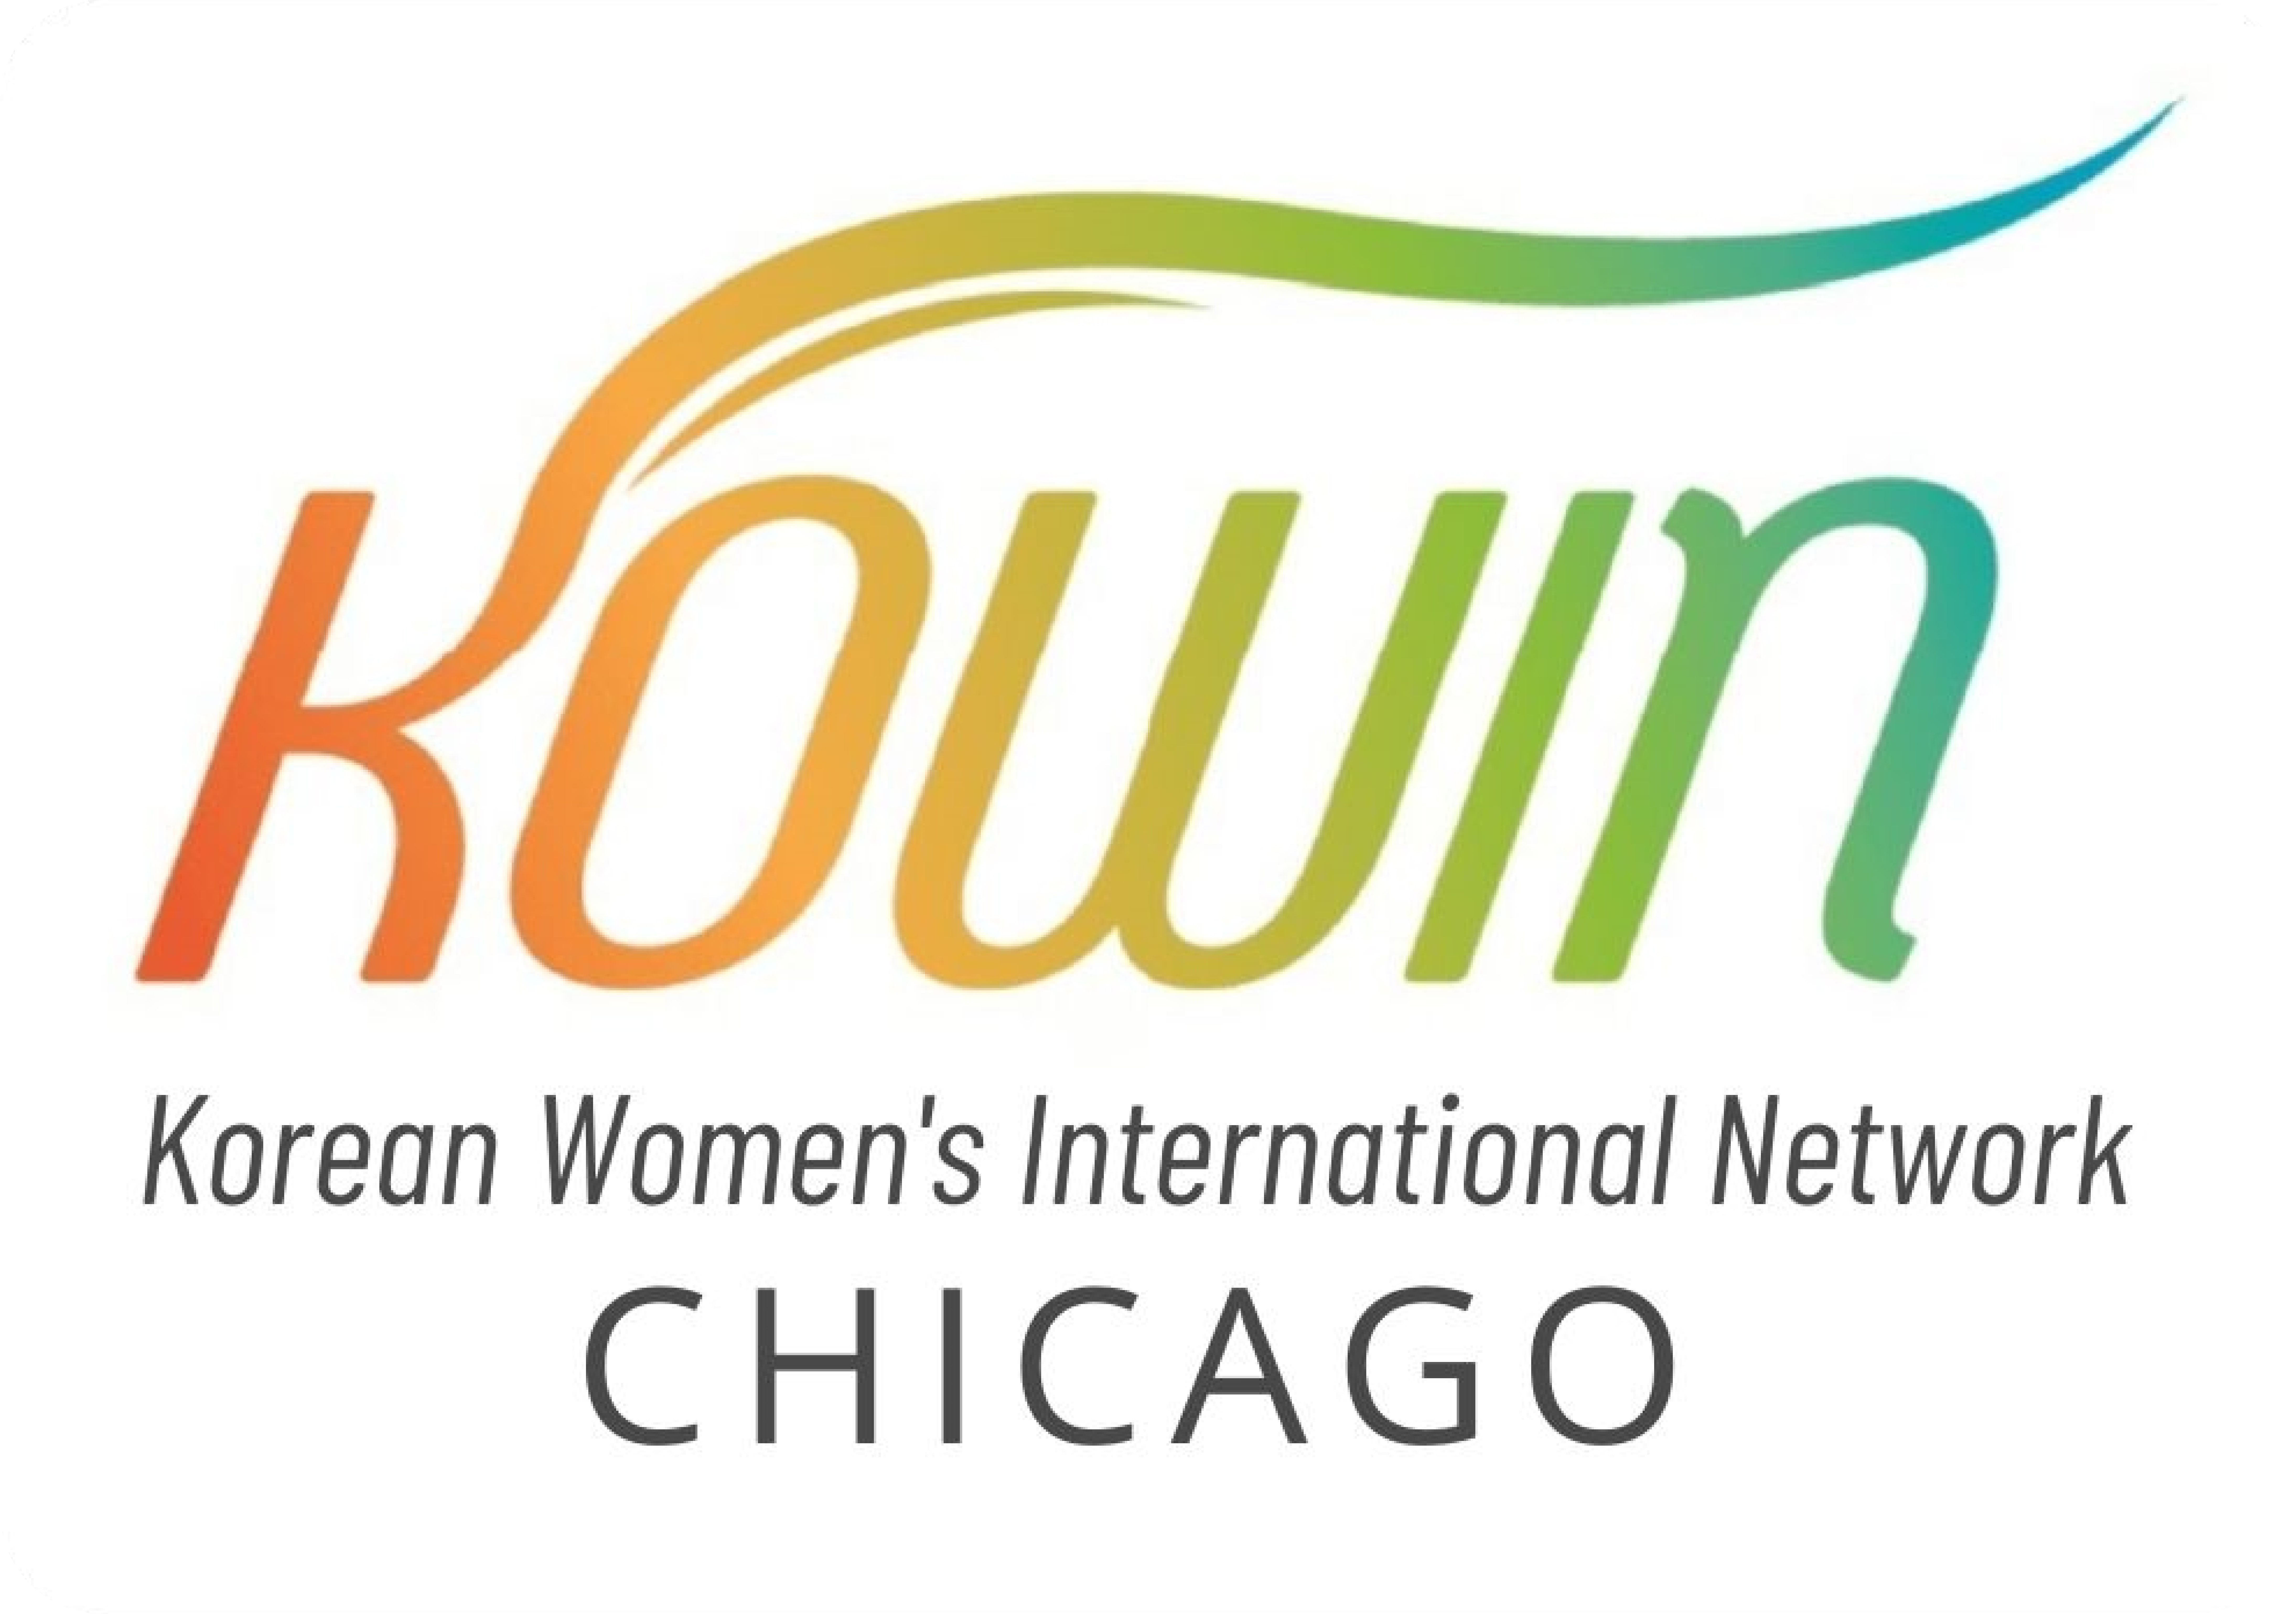 Korean Women's International Netowork